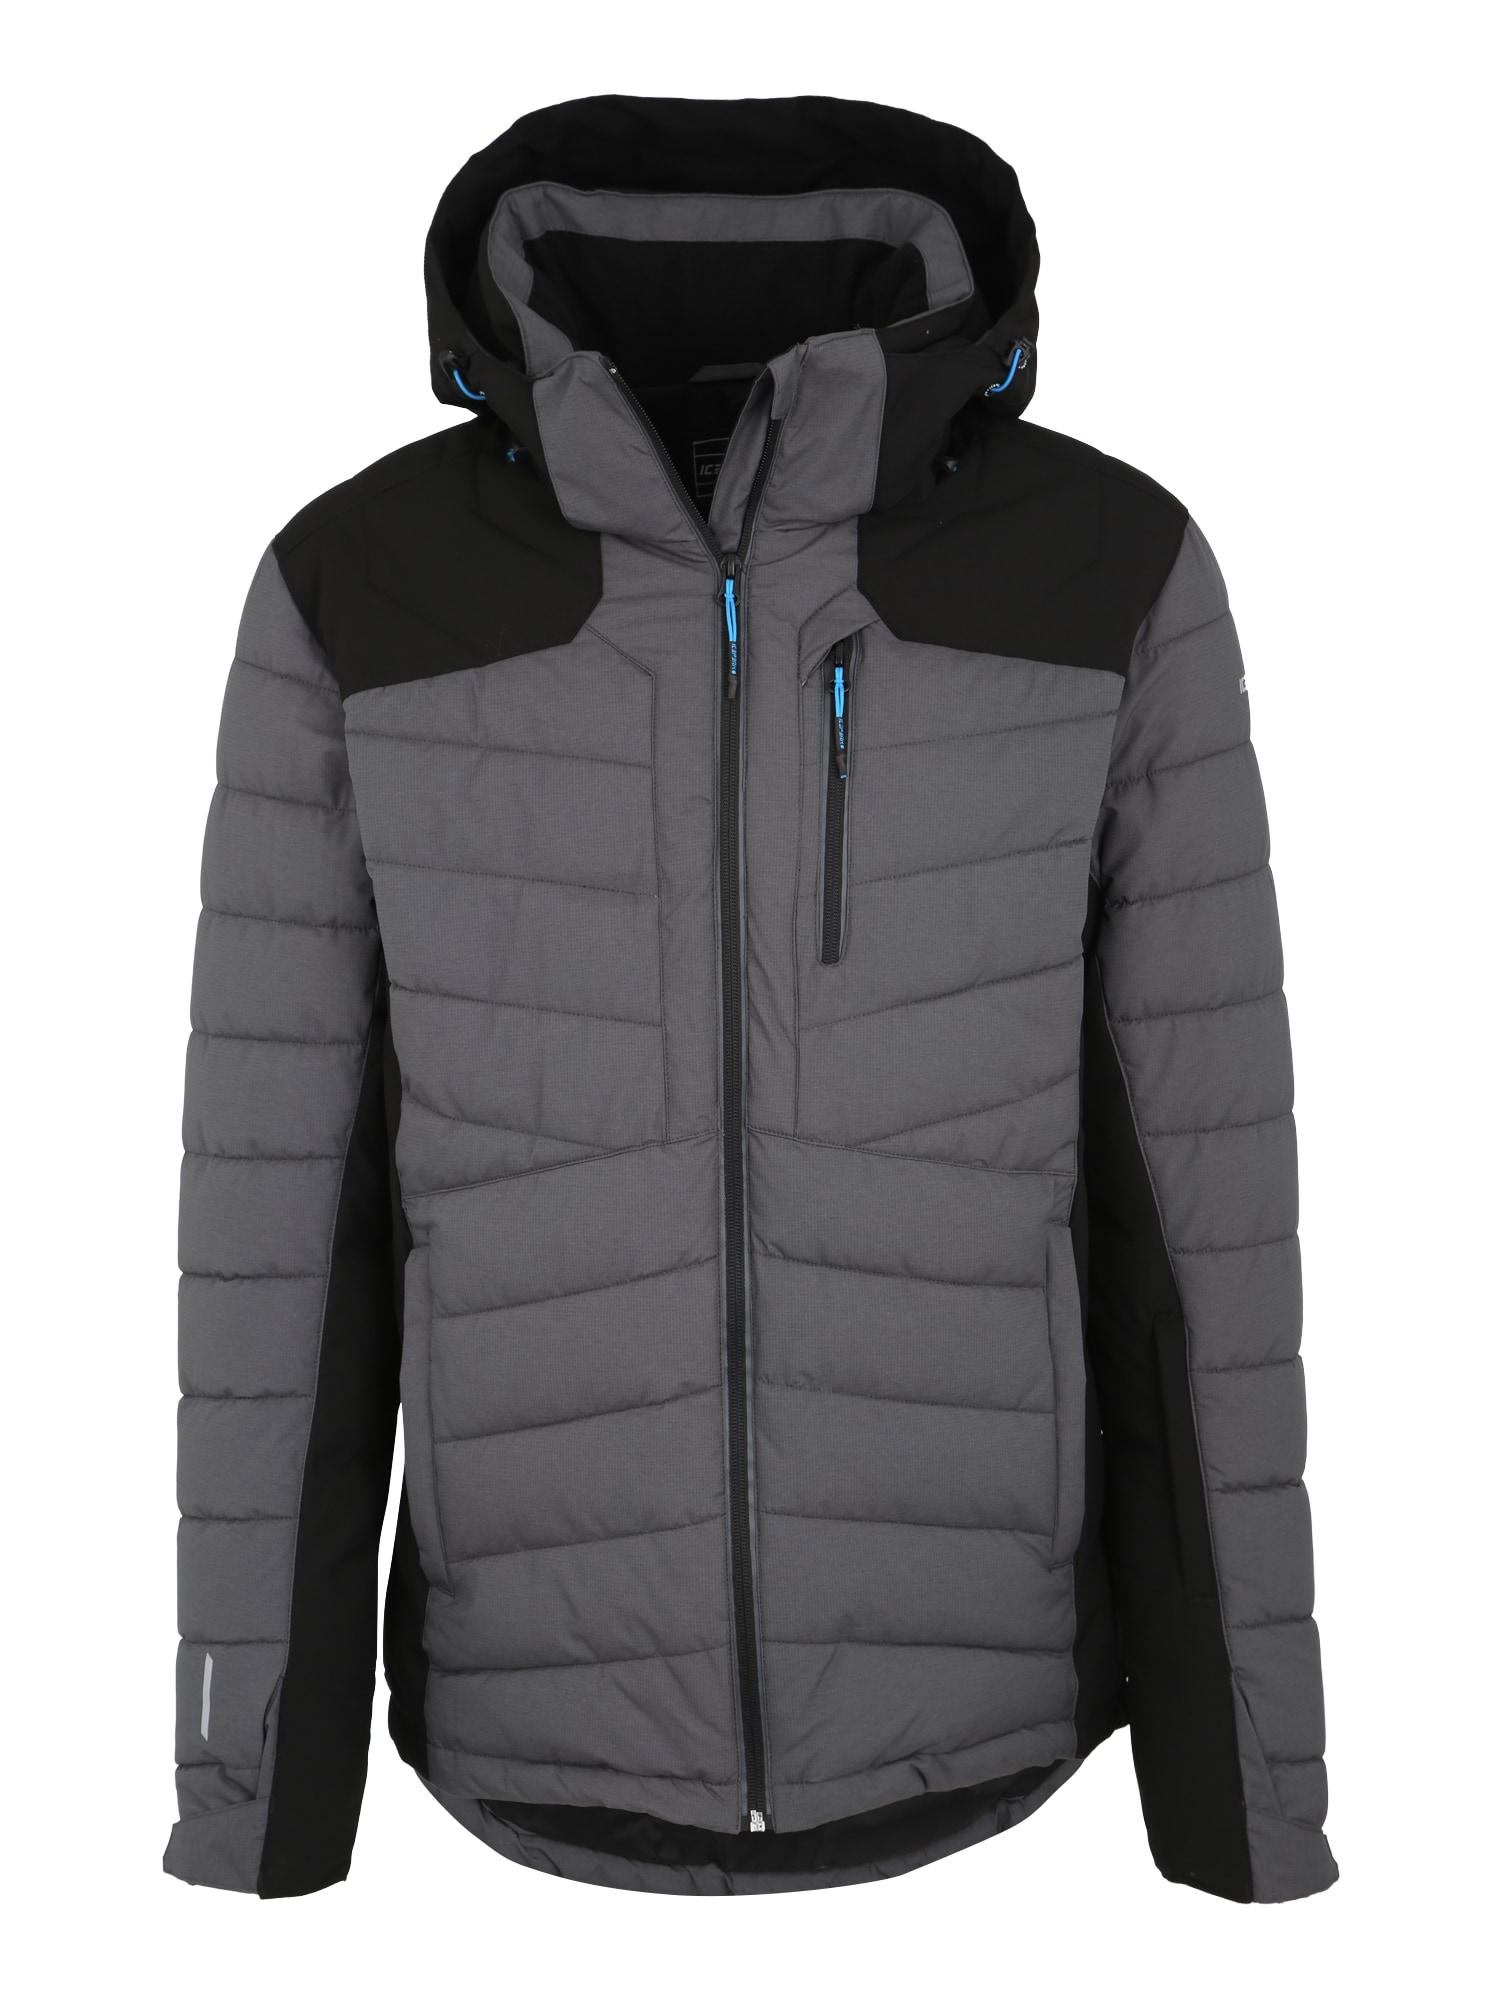 Outdoorová bunda KELSON tmavě šedá černá ICEPEAK